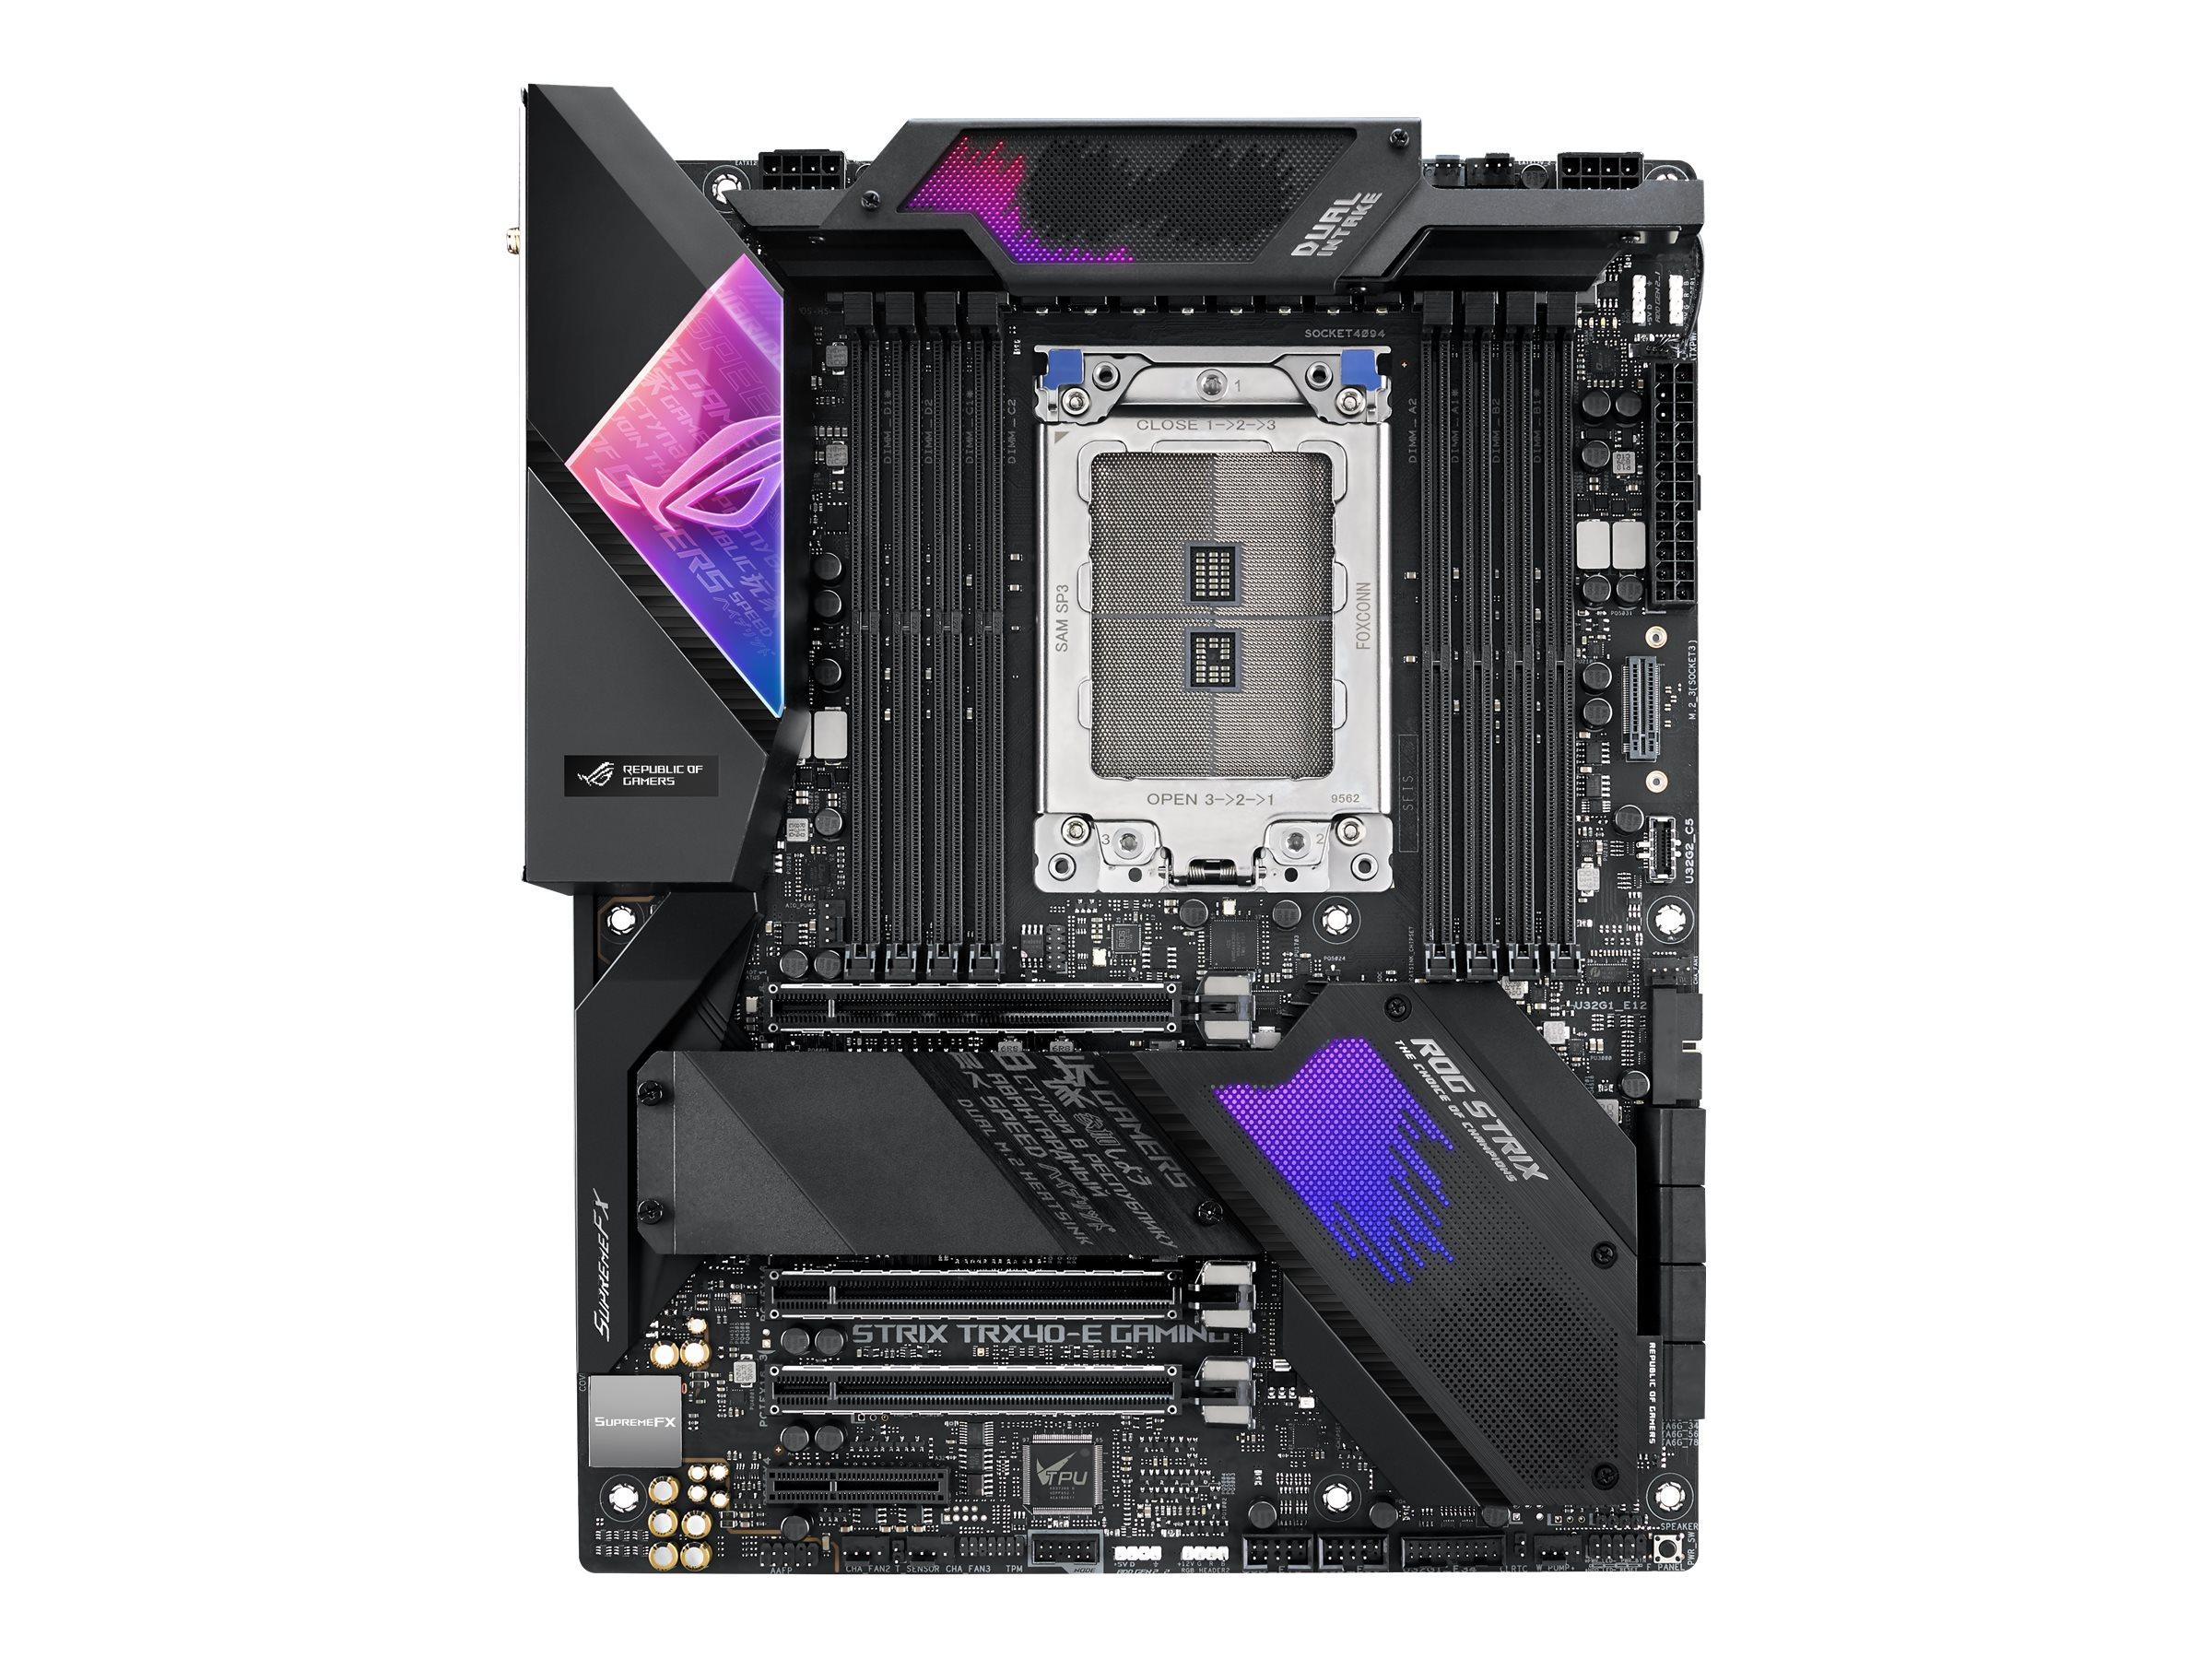 ASUS ROG Strix TRX40-E Gaming - Motherboard - ATX - Socket sTRX4 - AMD TRX40 - USB-C Gen2, USB 3.2 Gen 2 - Gigabit LAN,